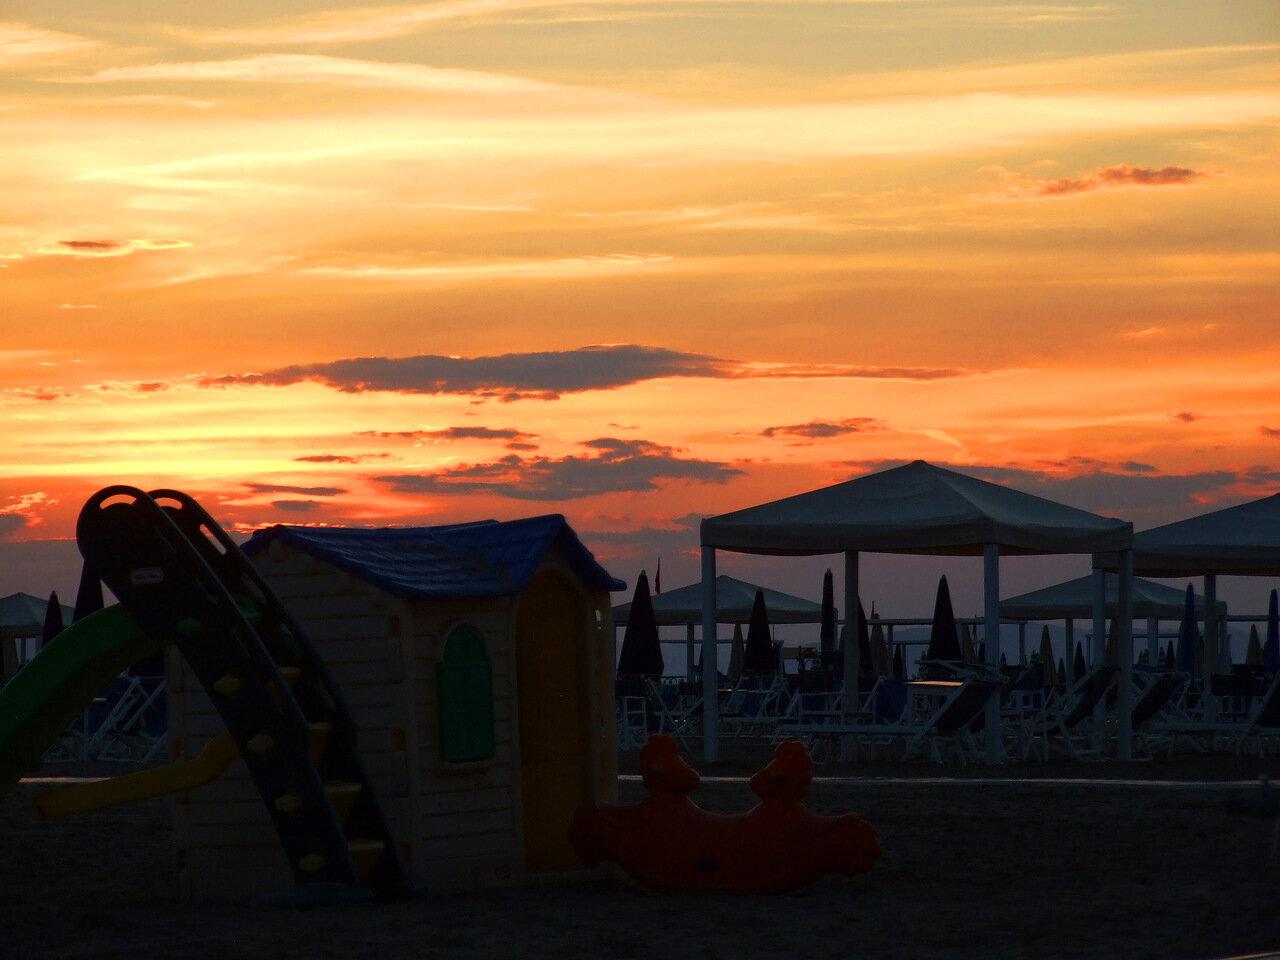 Закат над пляжем города Виареджо (Viareggio)